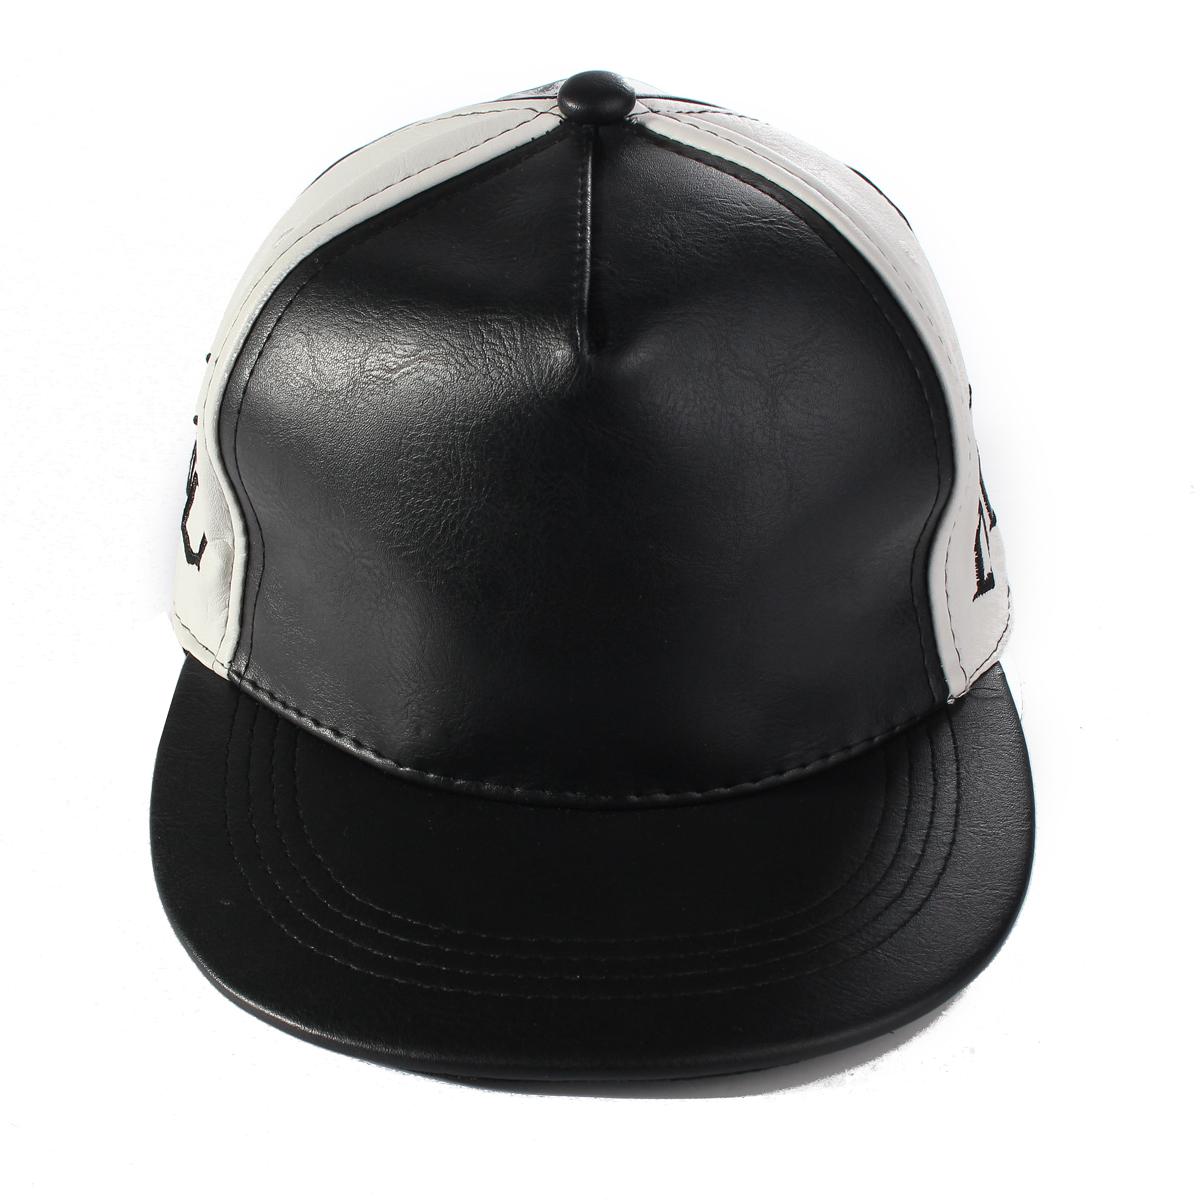 buy 88 embroidery pu snapback baseball cap adjustable hip. Black Bedroom Furniture Sets. Home Design Ideas